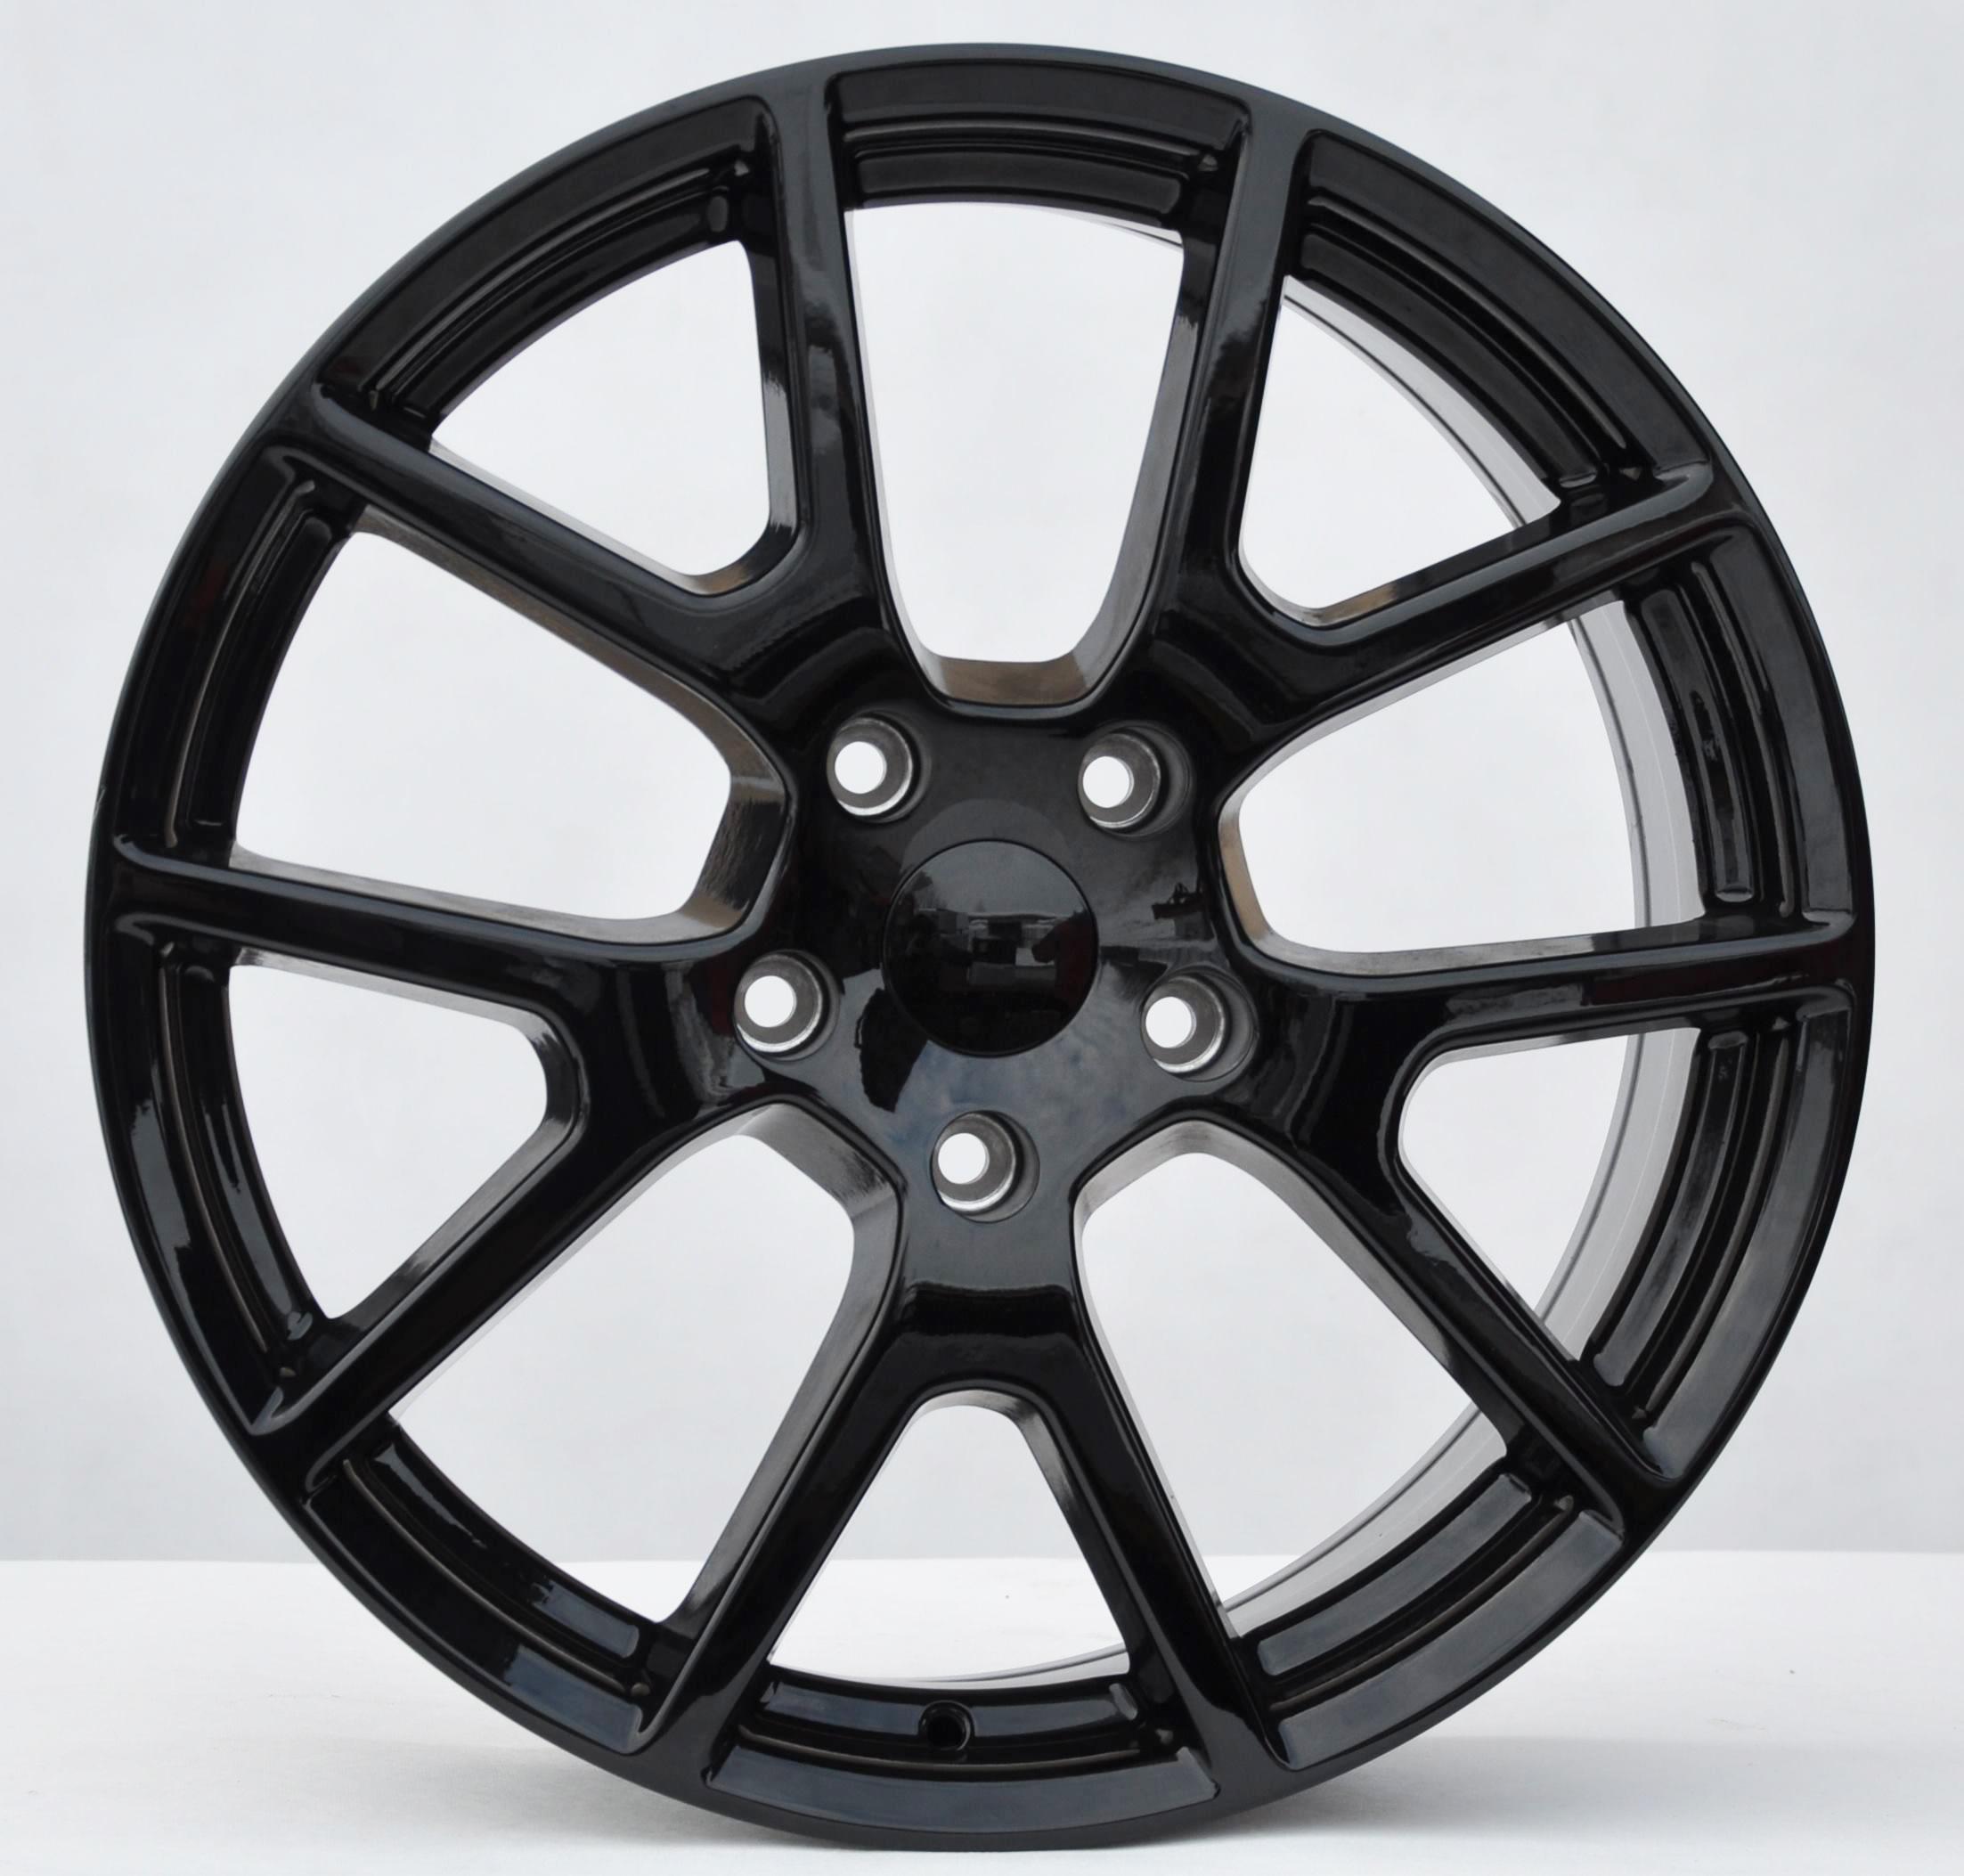 1386 B FELNI 19 5x127 FIAT FREEMONT CHRYSLER-2